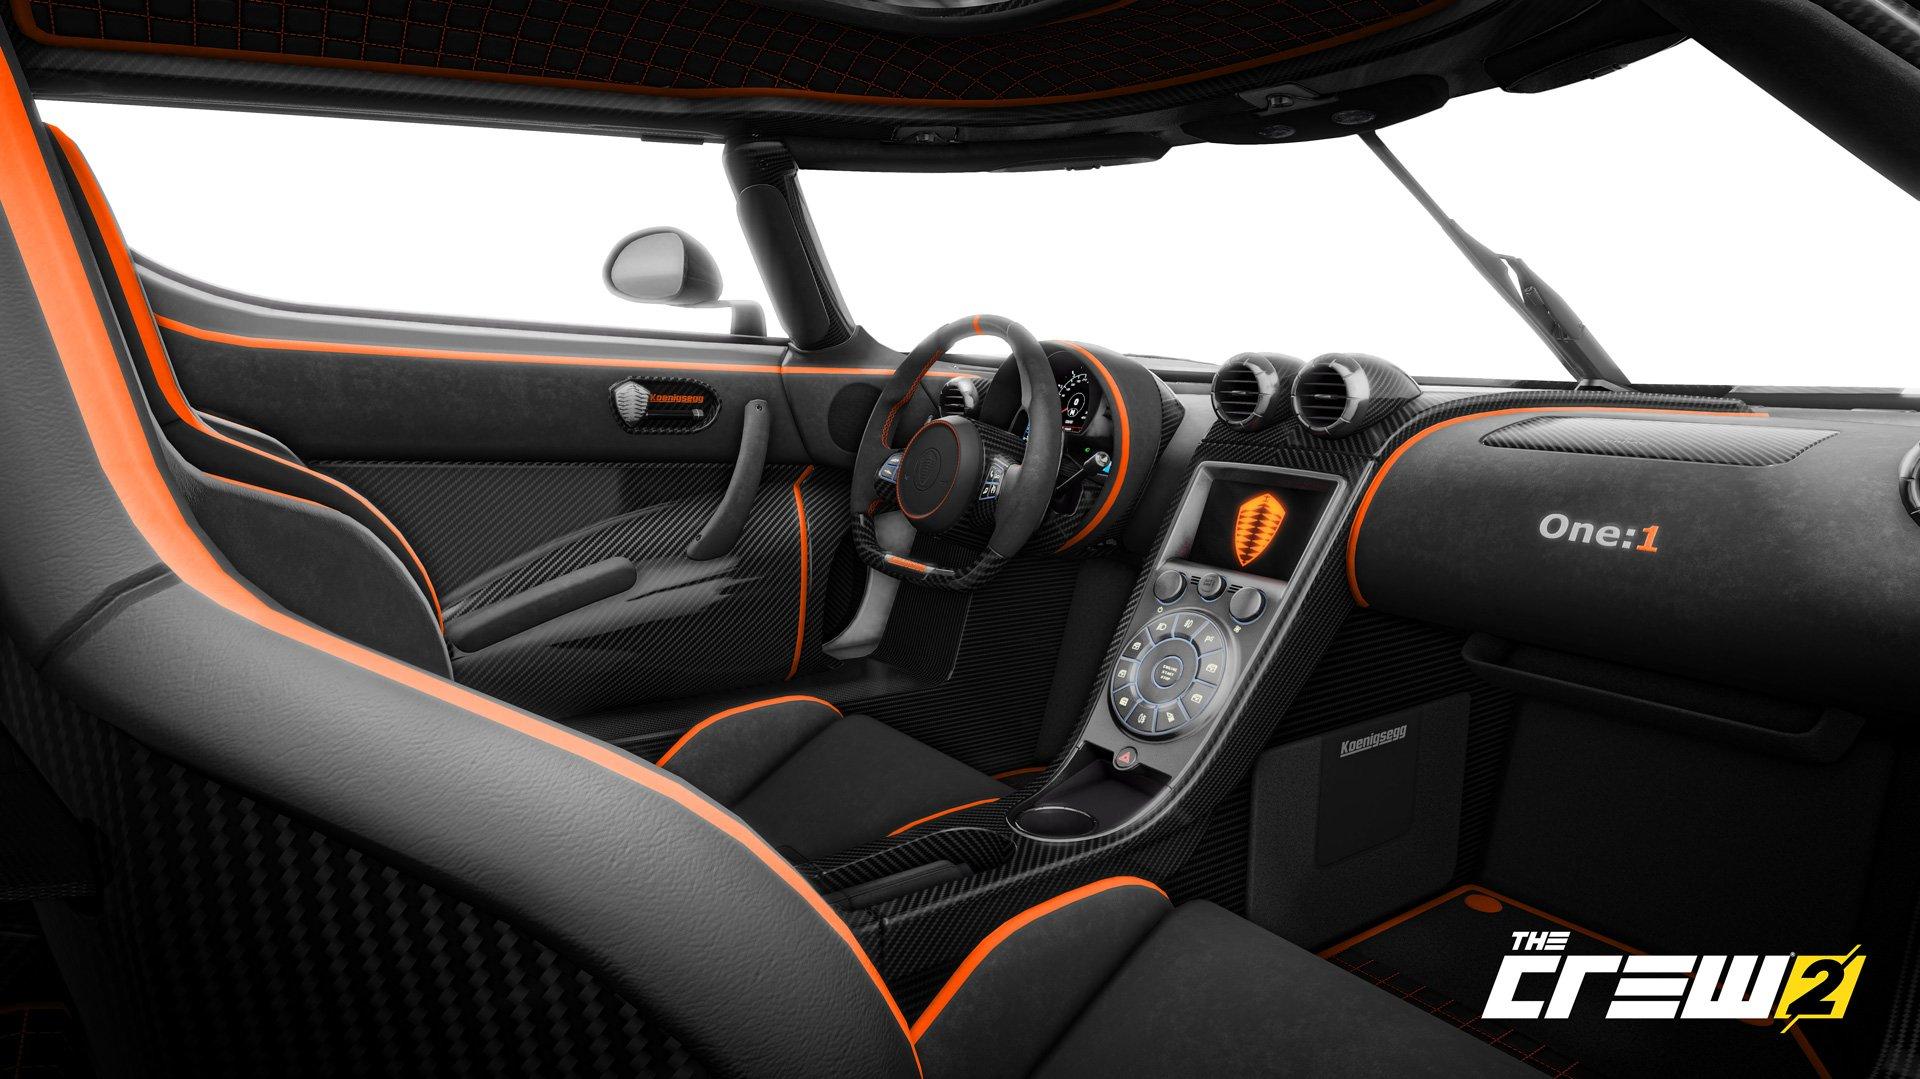 Tc2 Screen Koenigsegg 2 1920x1080 070720 6pm Cest